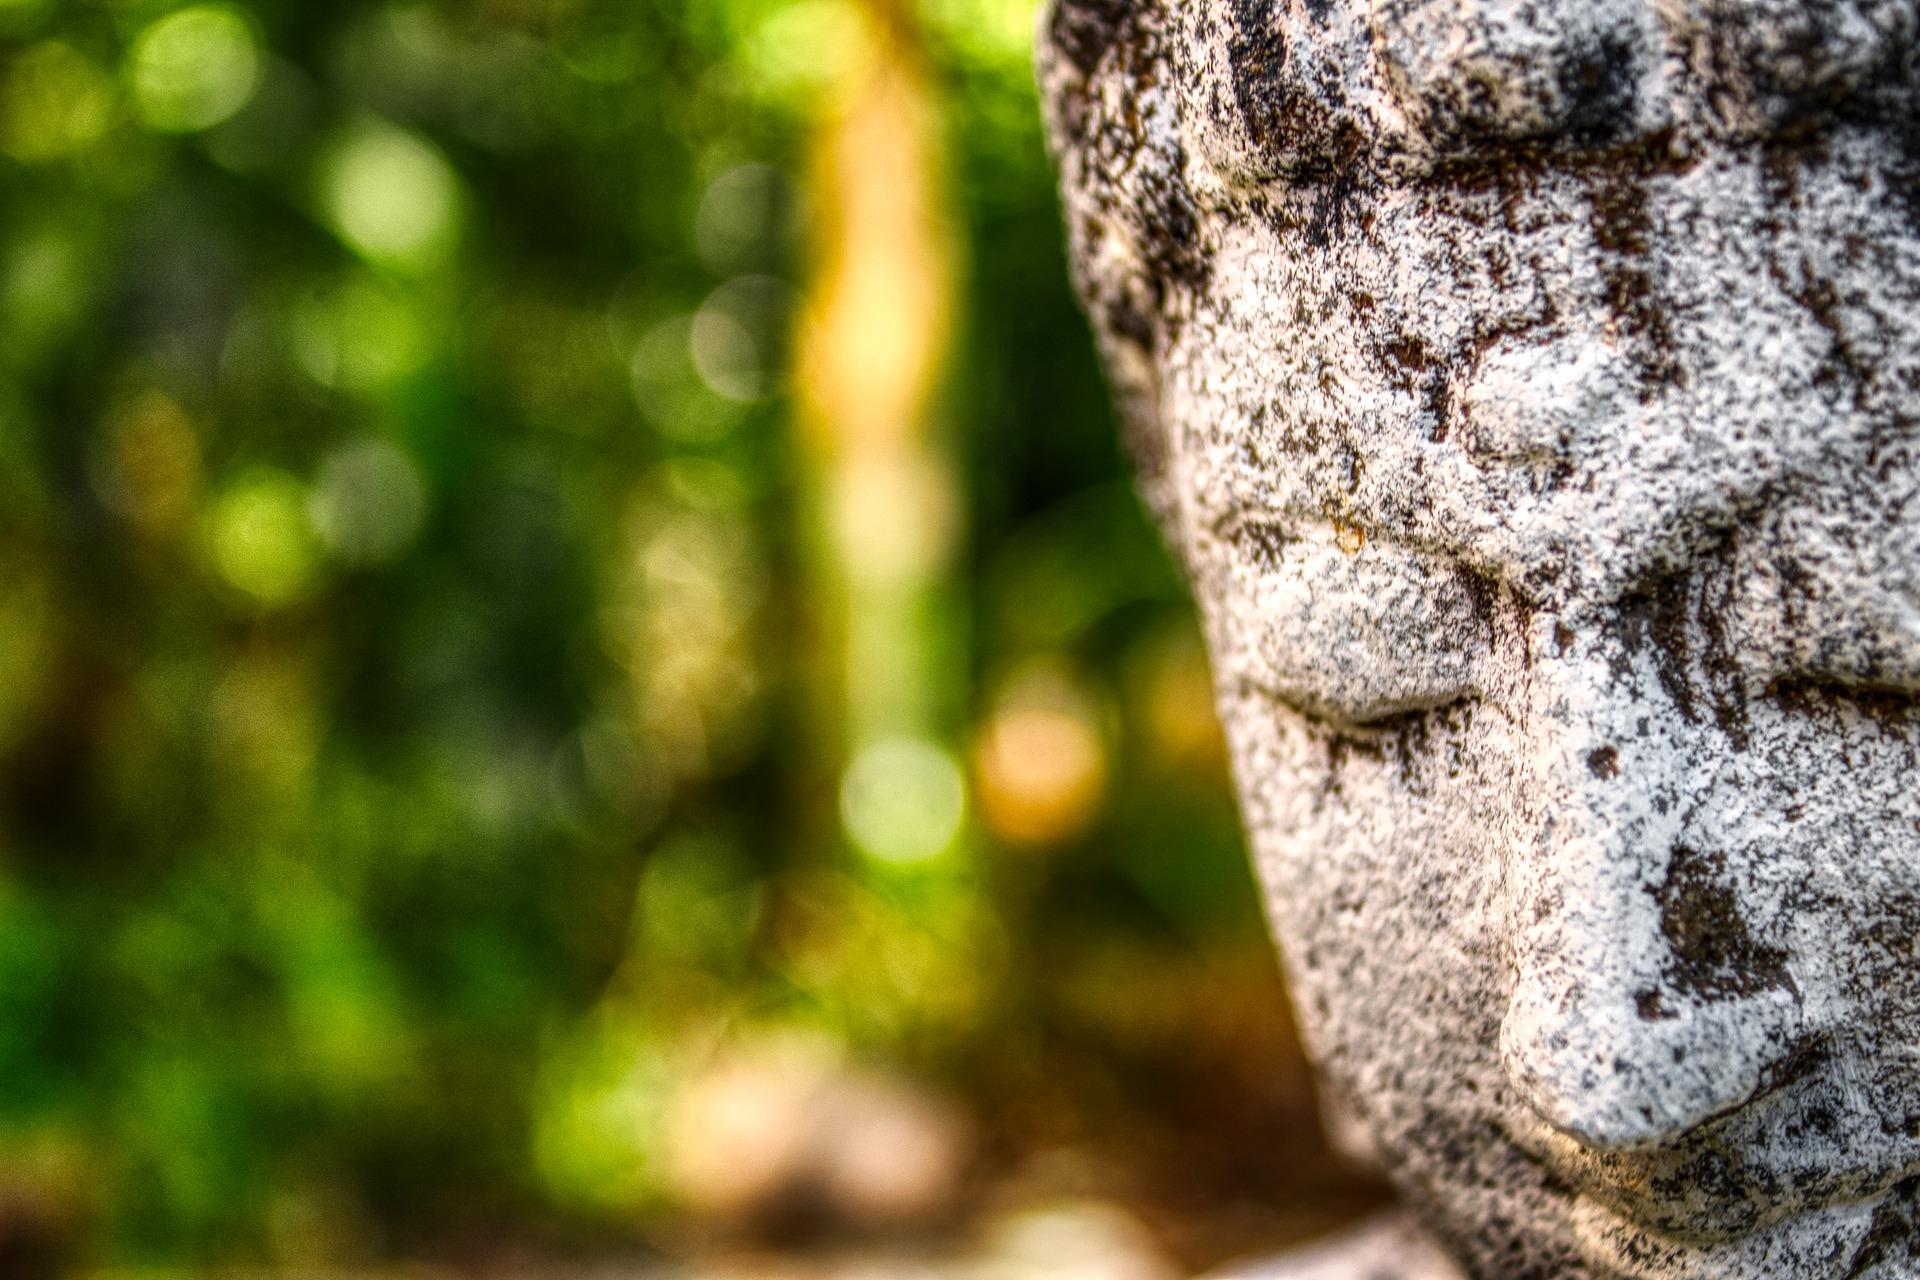 Buddha's meditation